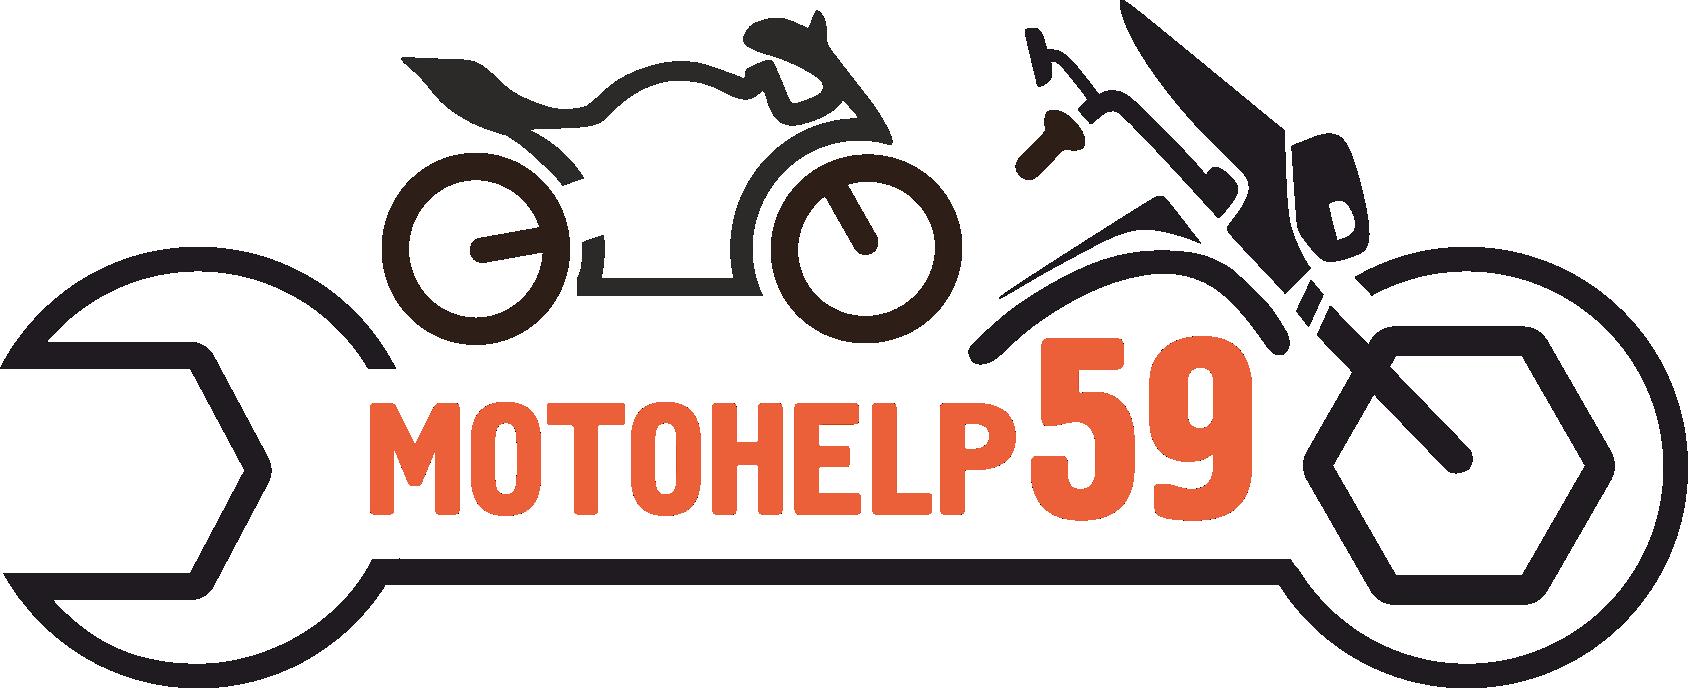 MotoHelp59